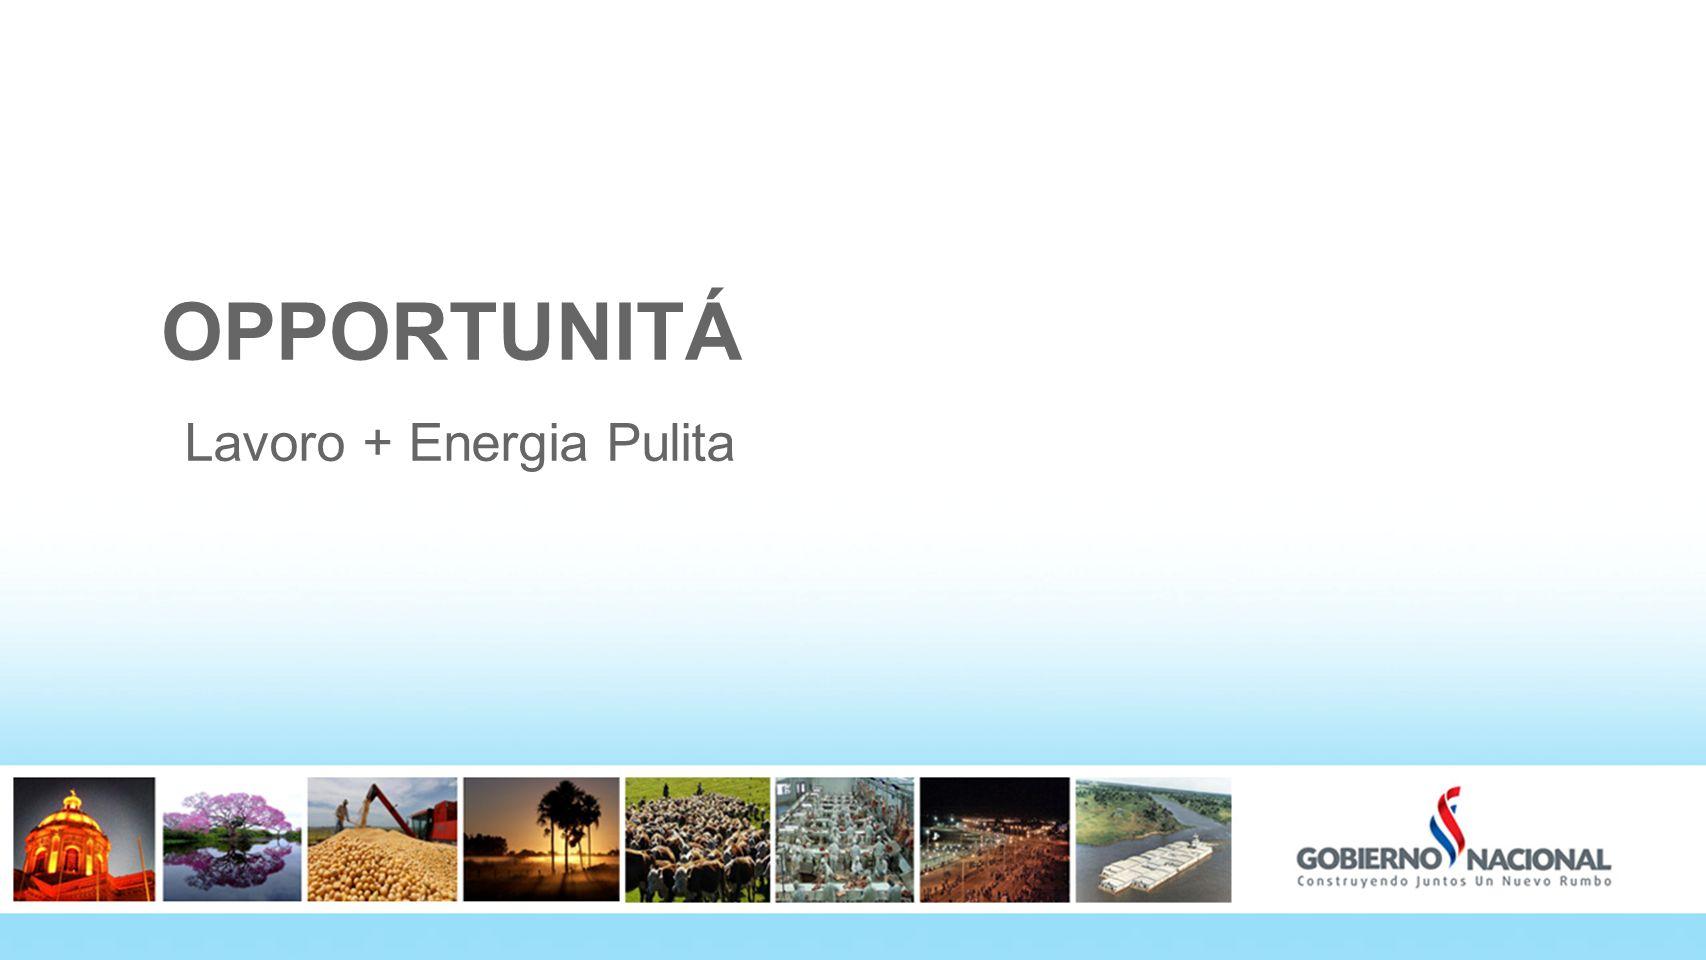 OPPORTUNITÁ Lavoro + Energia Pulita